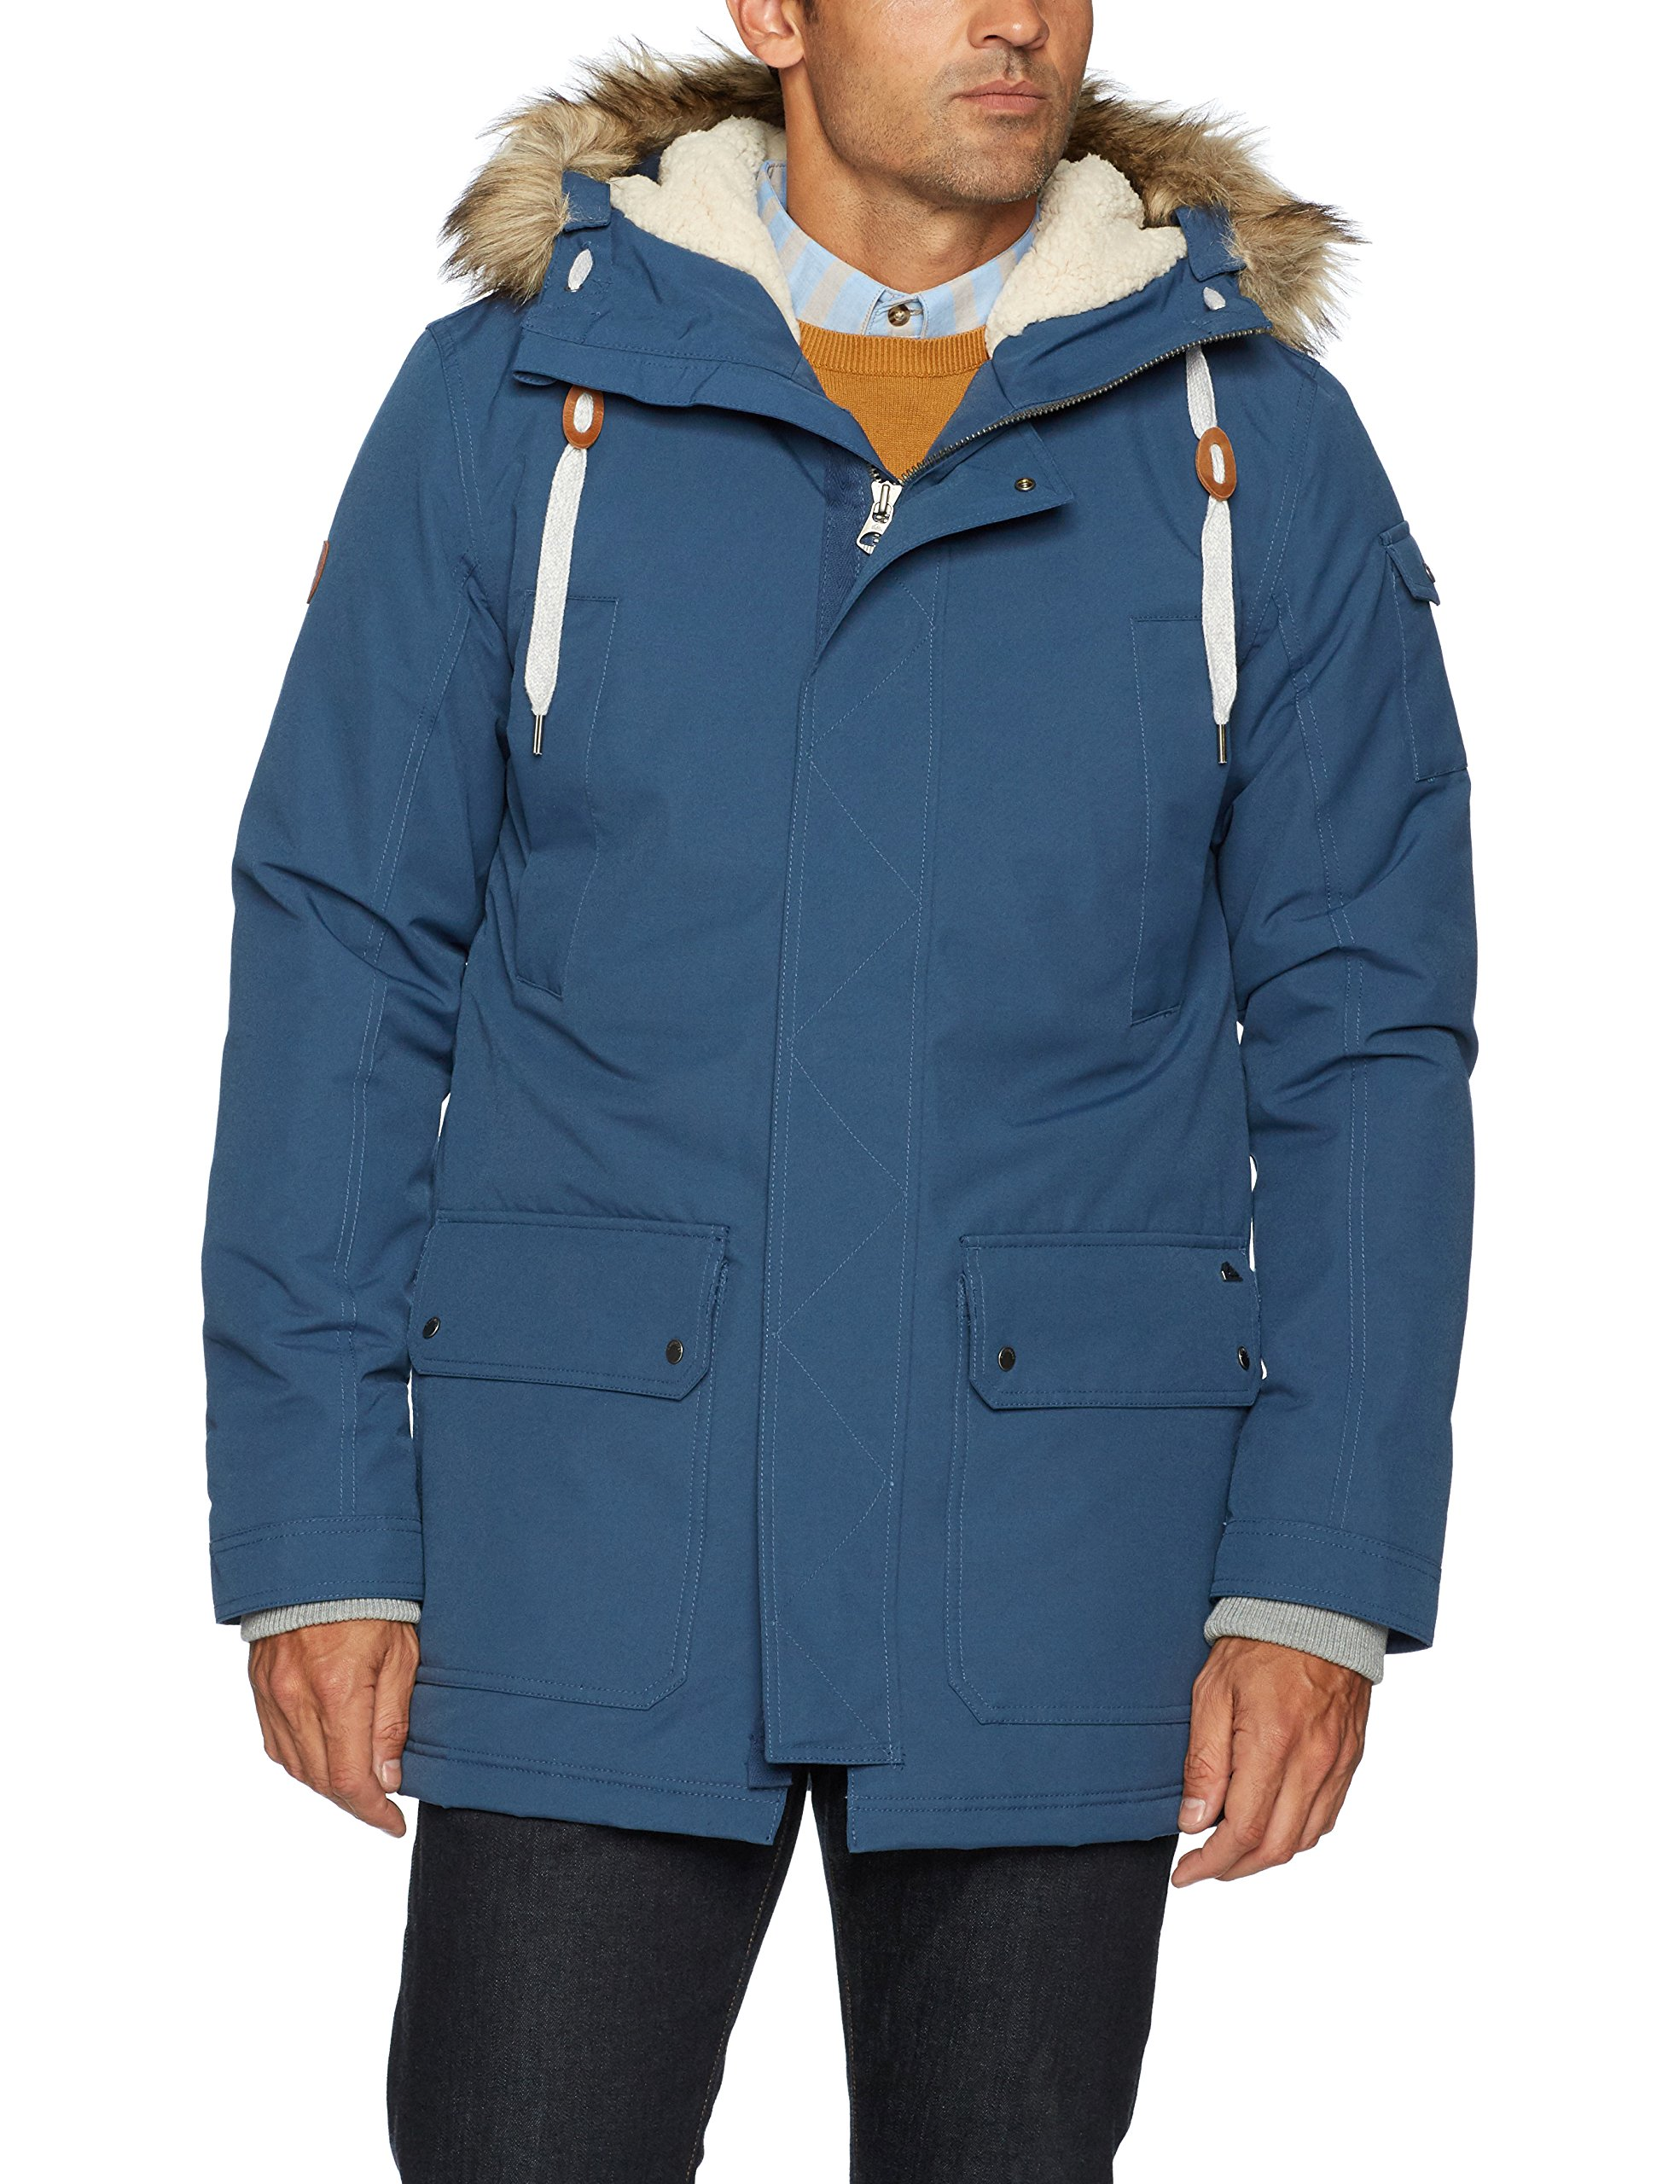 Quiksilver Men's Ferris Parka 10K Snow Jacket, Dark Denim, 2XL